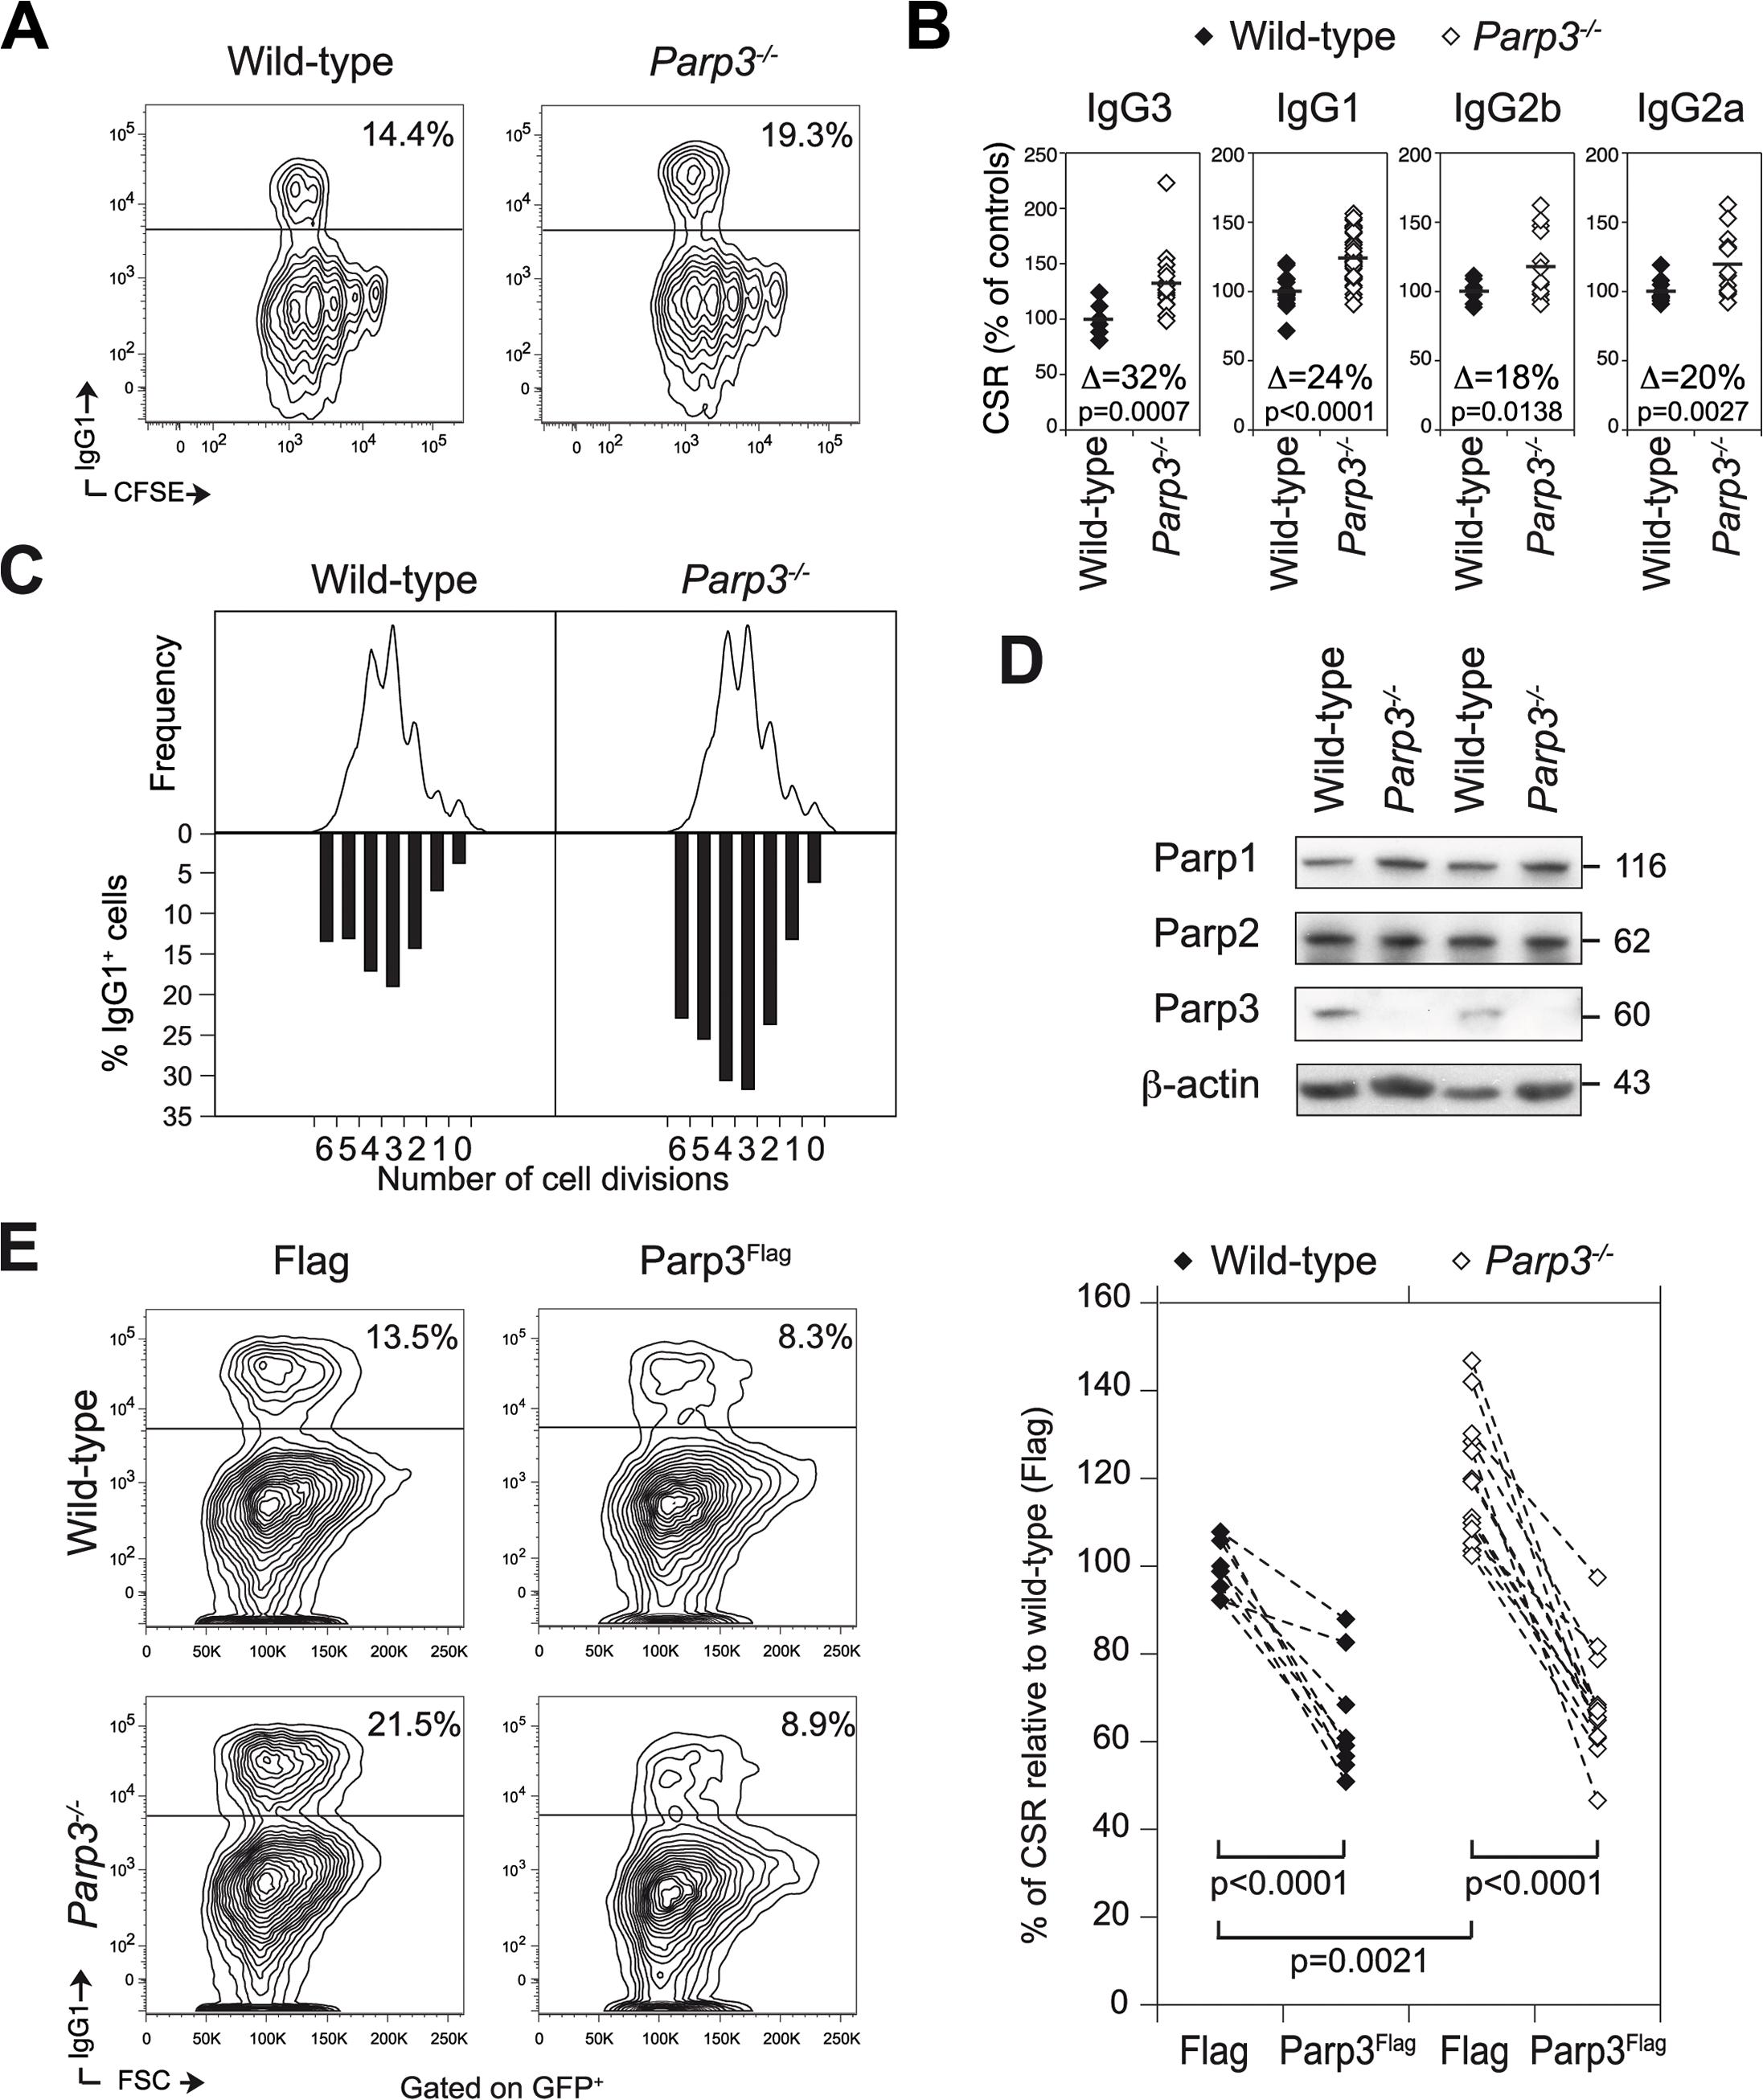 Parp3 is a negative regulator of immunoglobulin class switch recombination.